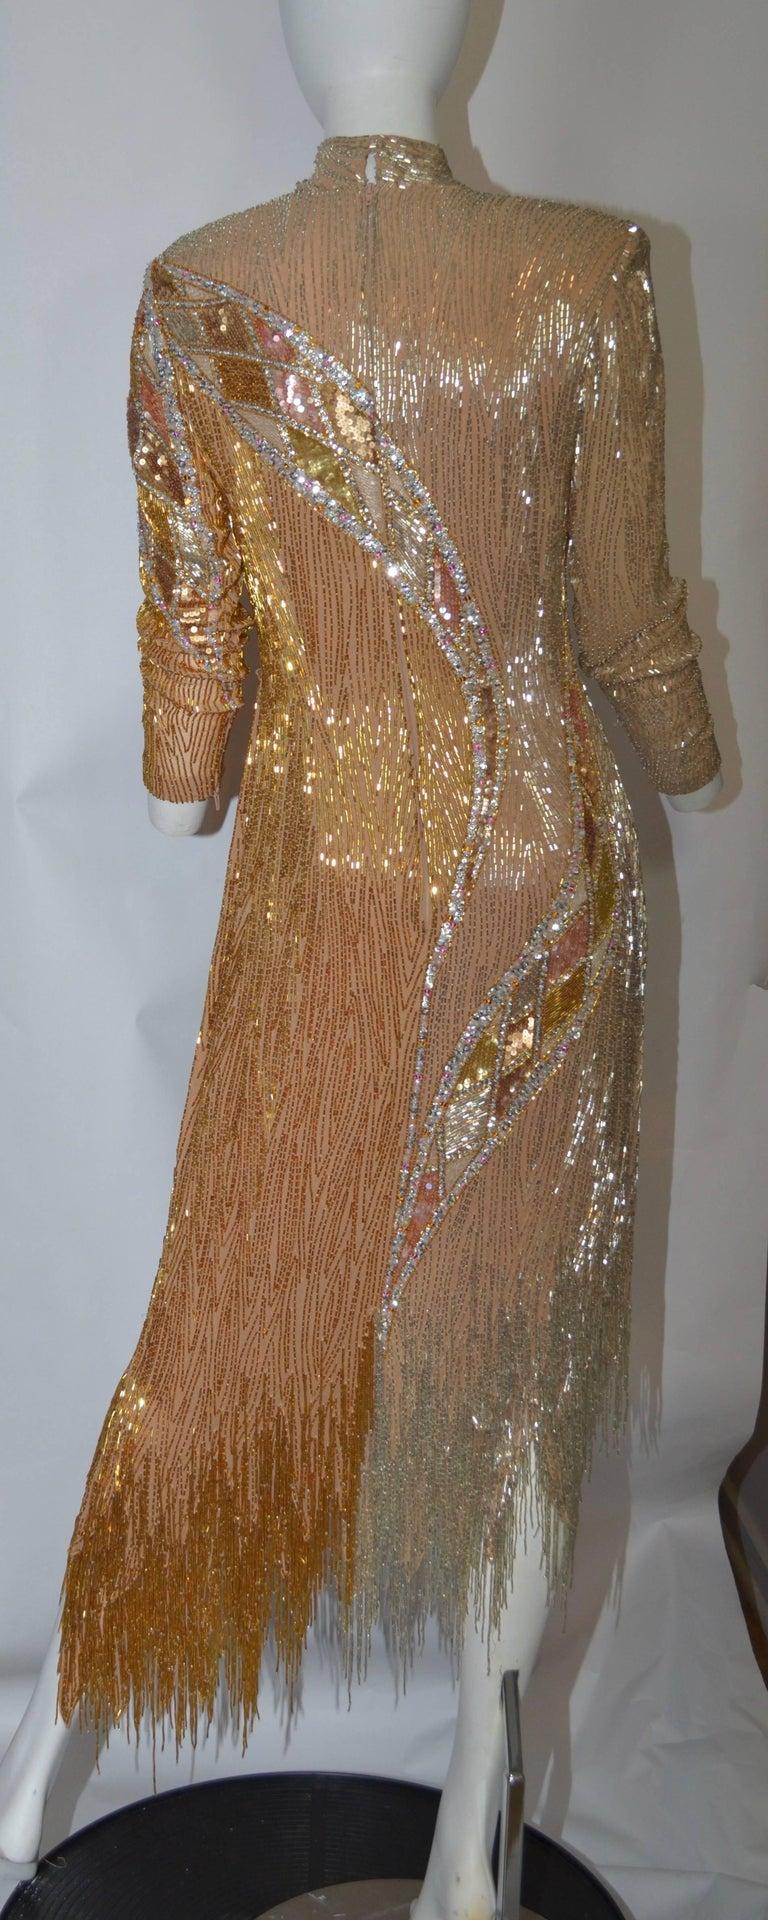 Bob Mackie 1980\'s Gold Fringe Beaded Dress For Sale at 1stdibs